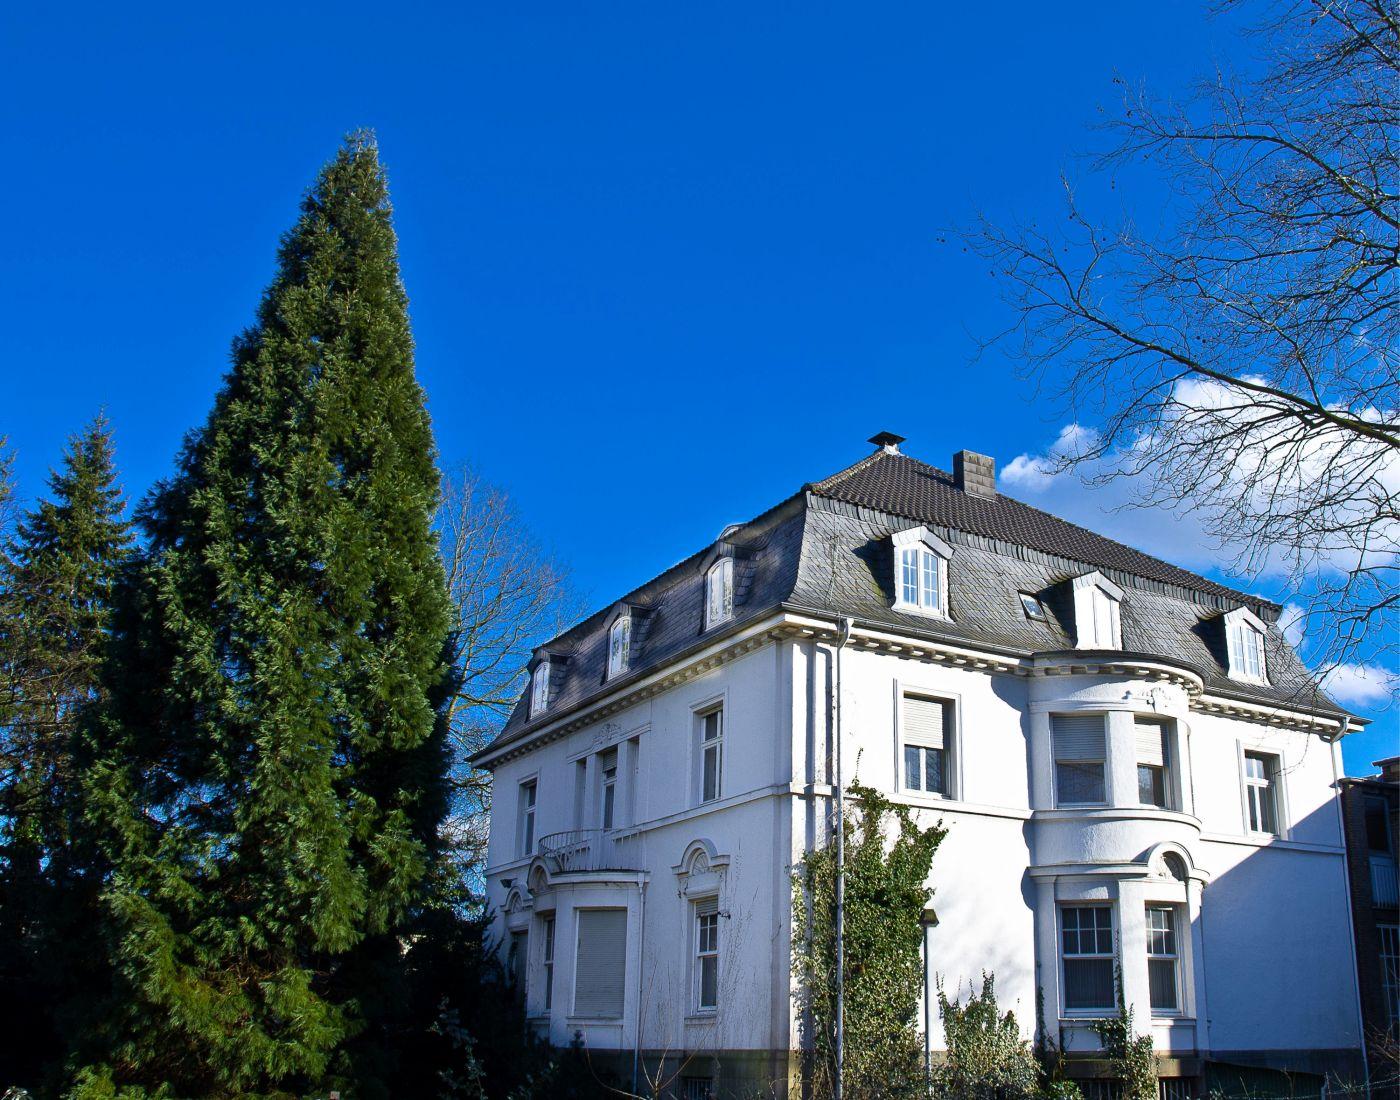 villa marx viersen denkmalschutz immobilien. Black Bedroom Furniture Sets. Home Design Ideas